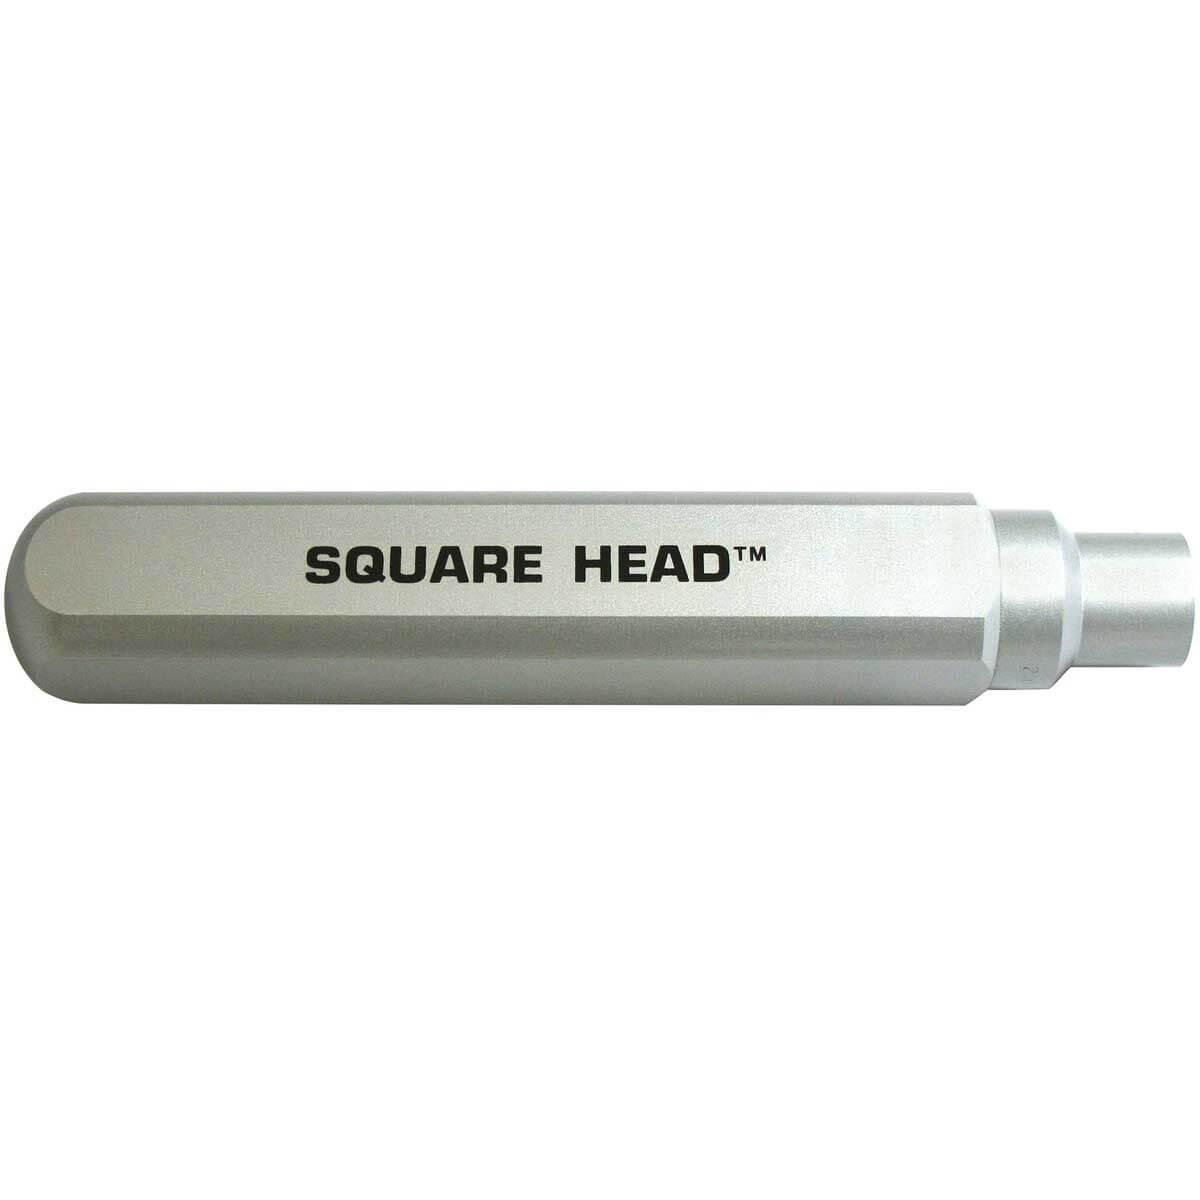 Wyco Square Heads 9500 Vibrator